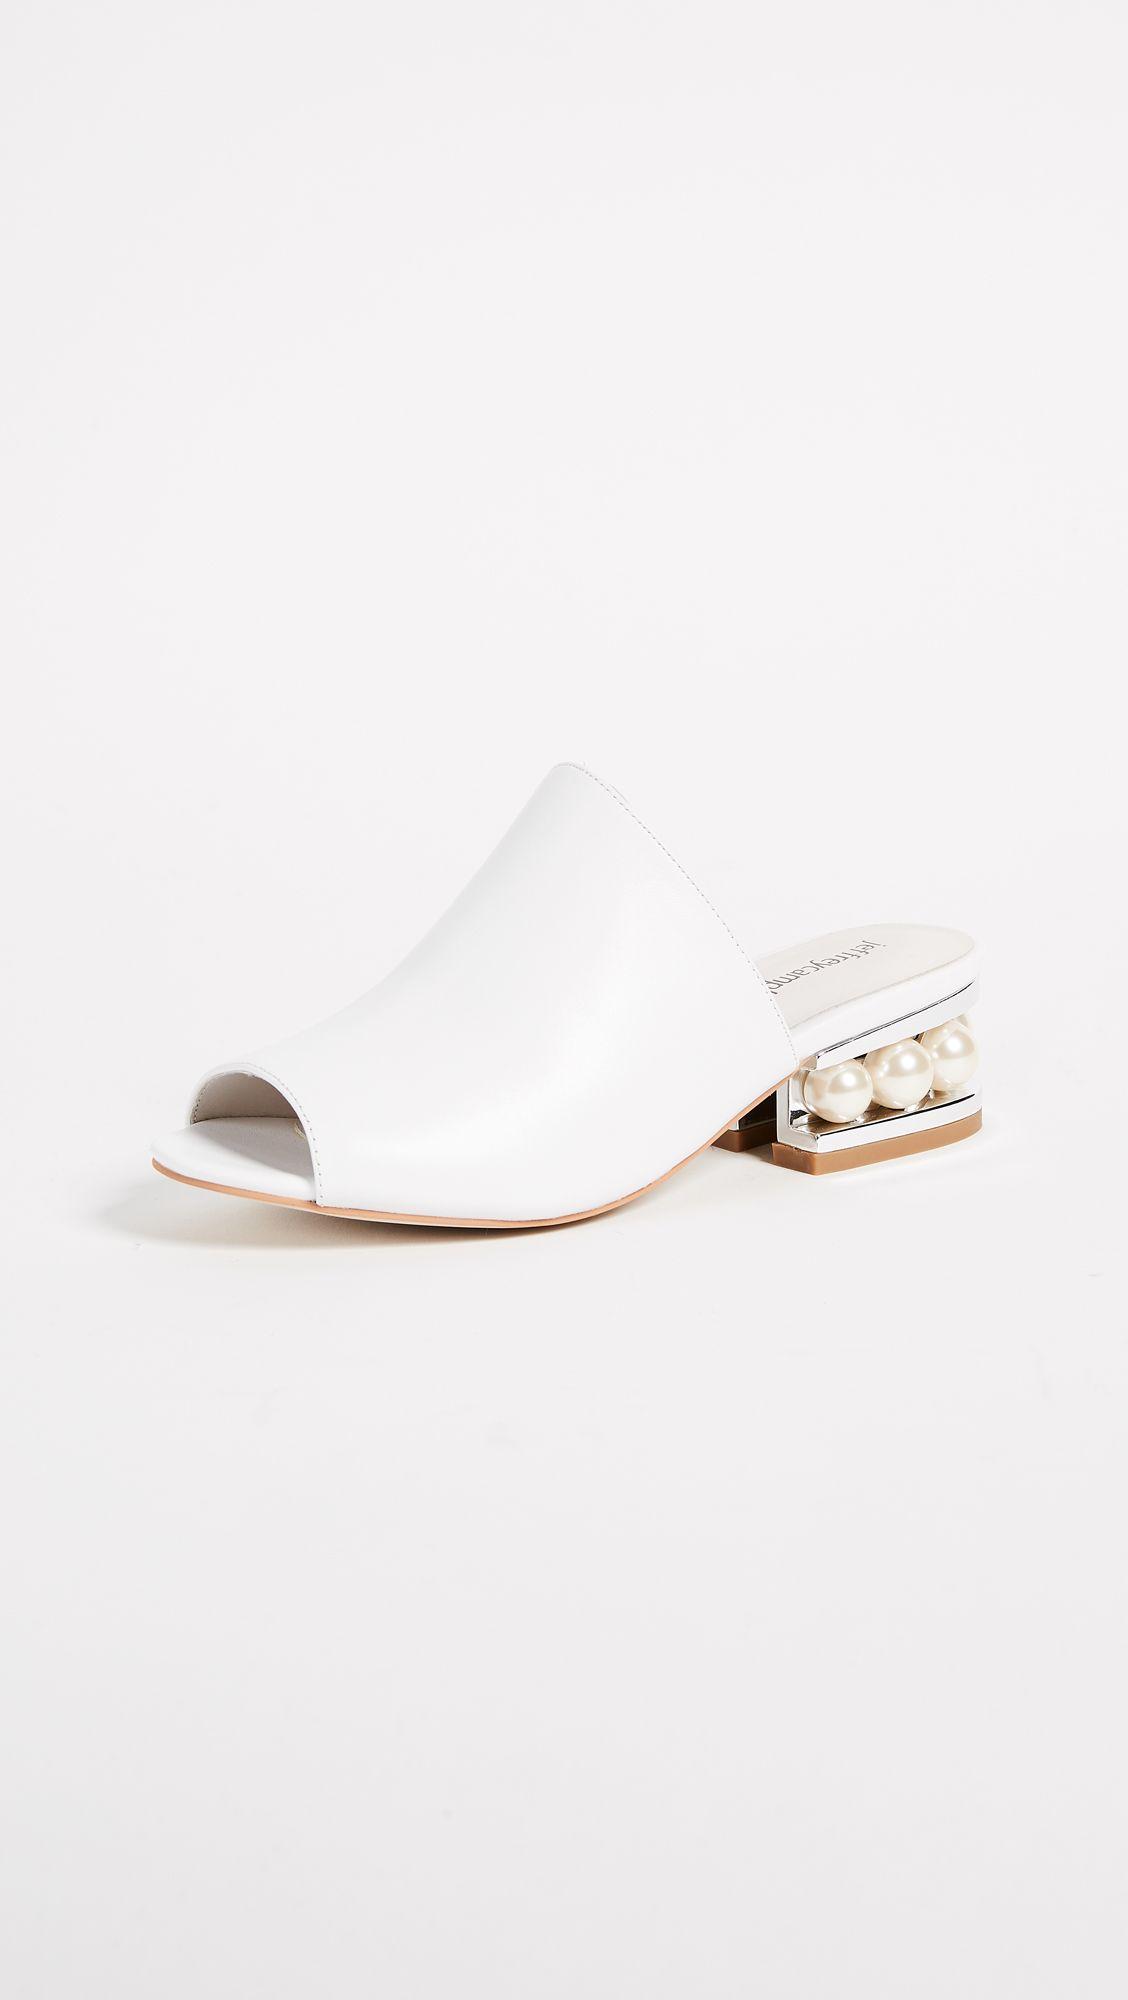 6e2f8b2fe57 Jeffrey Campbell Arcita Mule Sandals